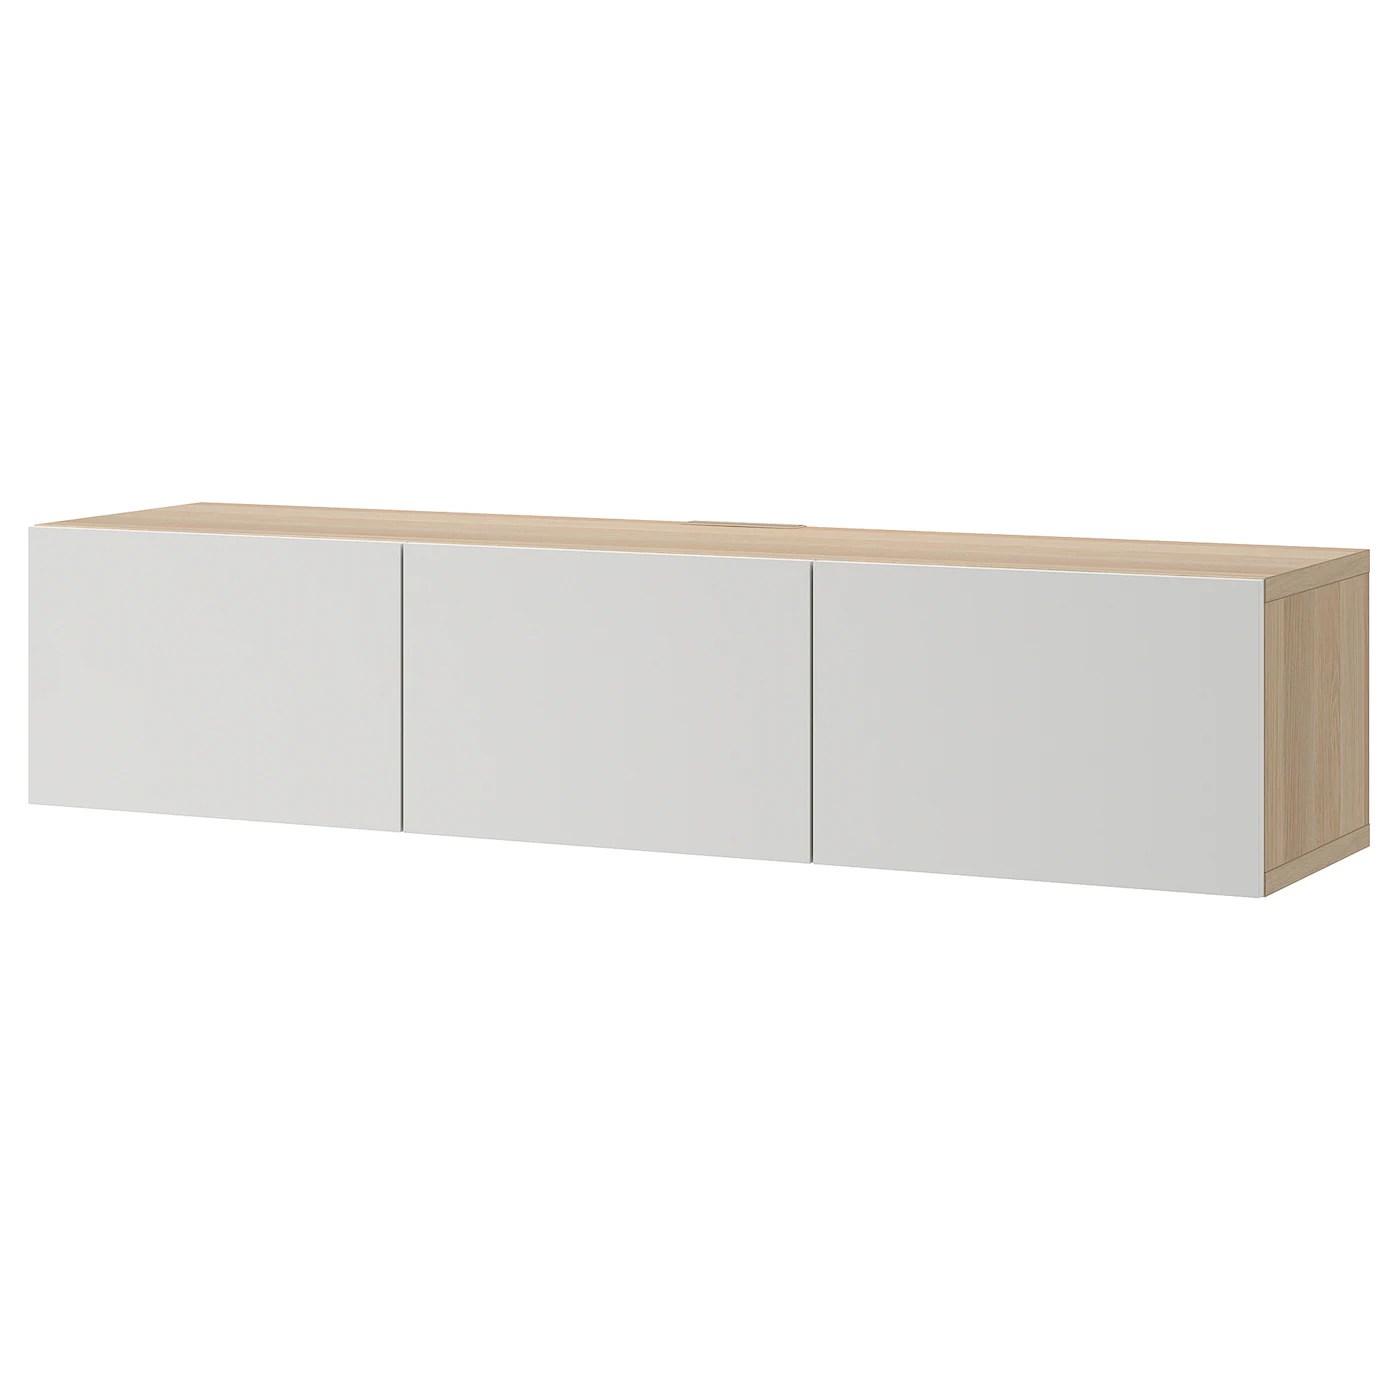 besta banc tv avec portes effet chene blanchi lappviken gris clair 180x42x38 cm